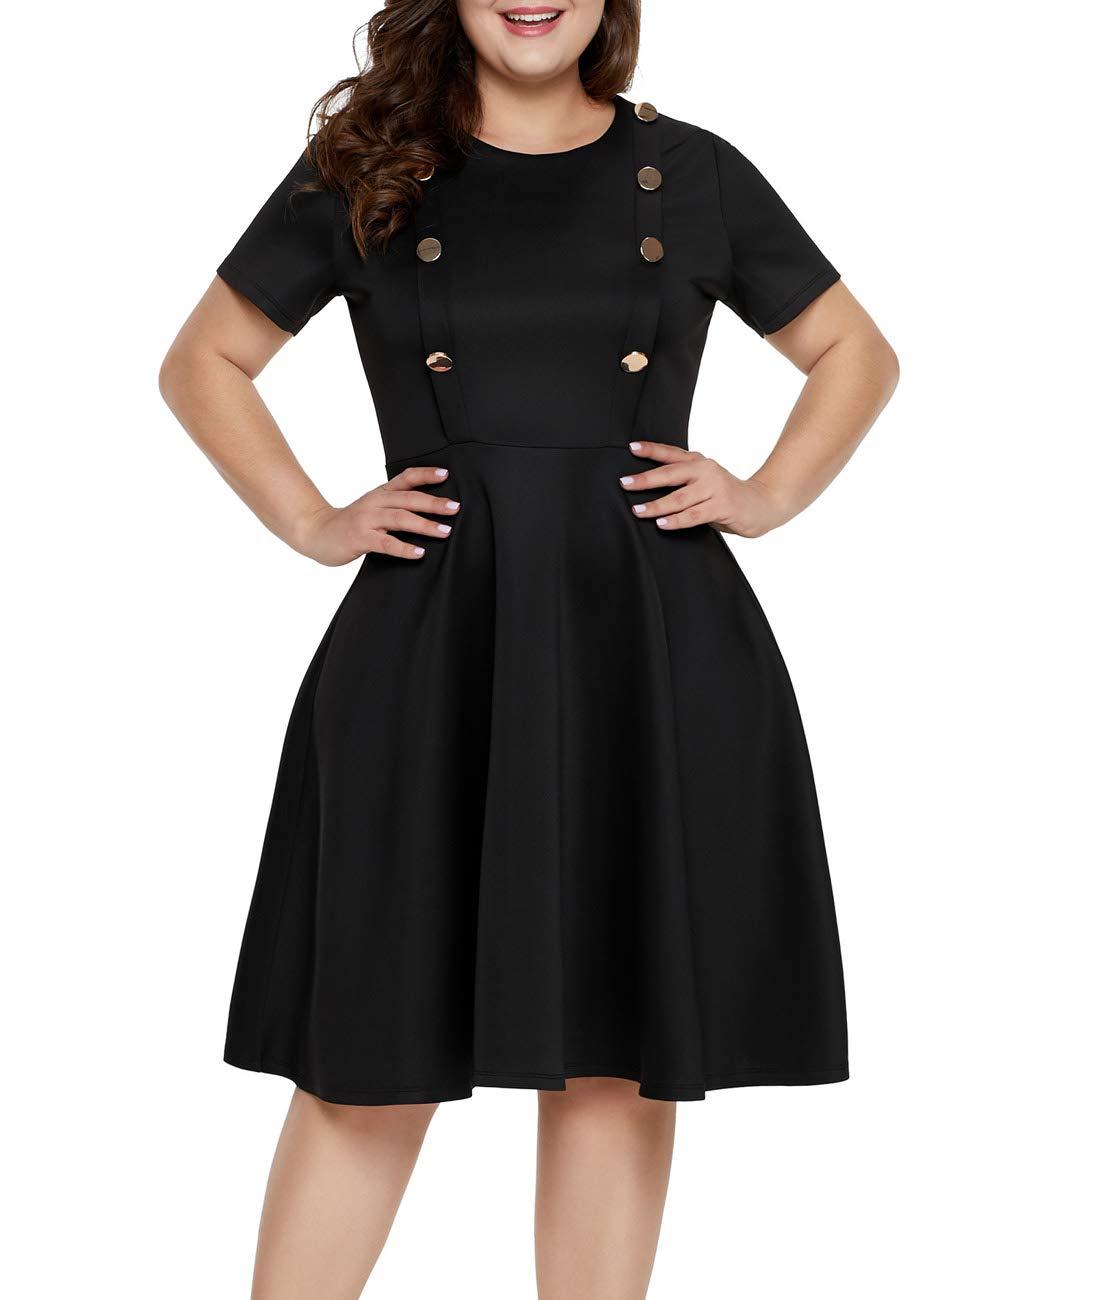 a6ed4018780c2 Lalagen Women Plus Size Short Sleeve Round Neck Cocktail Party Swing Midi Dress  Black 5X